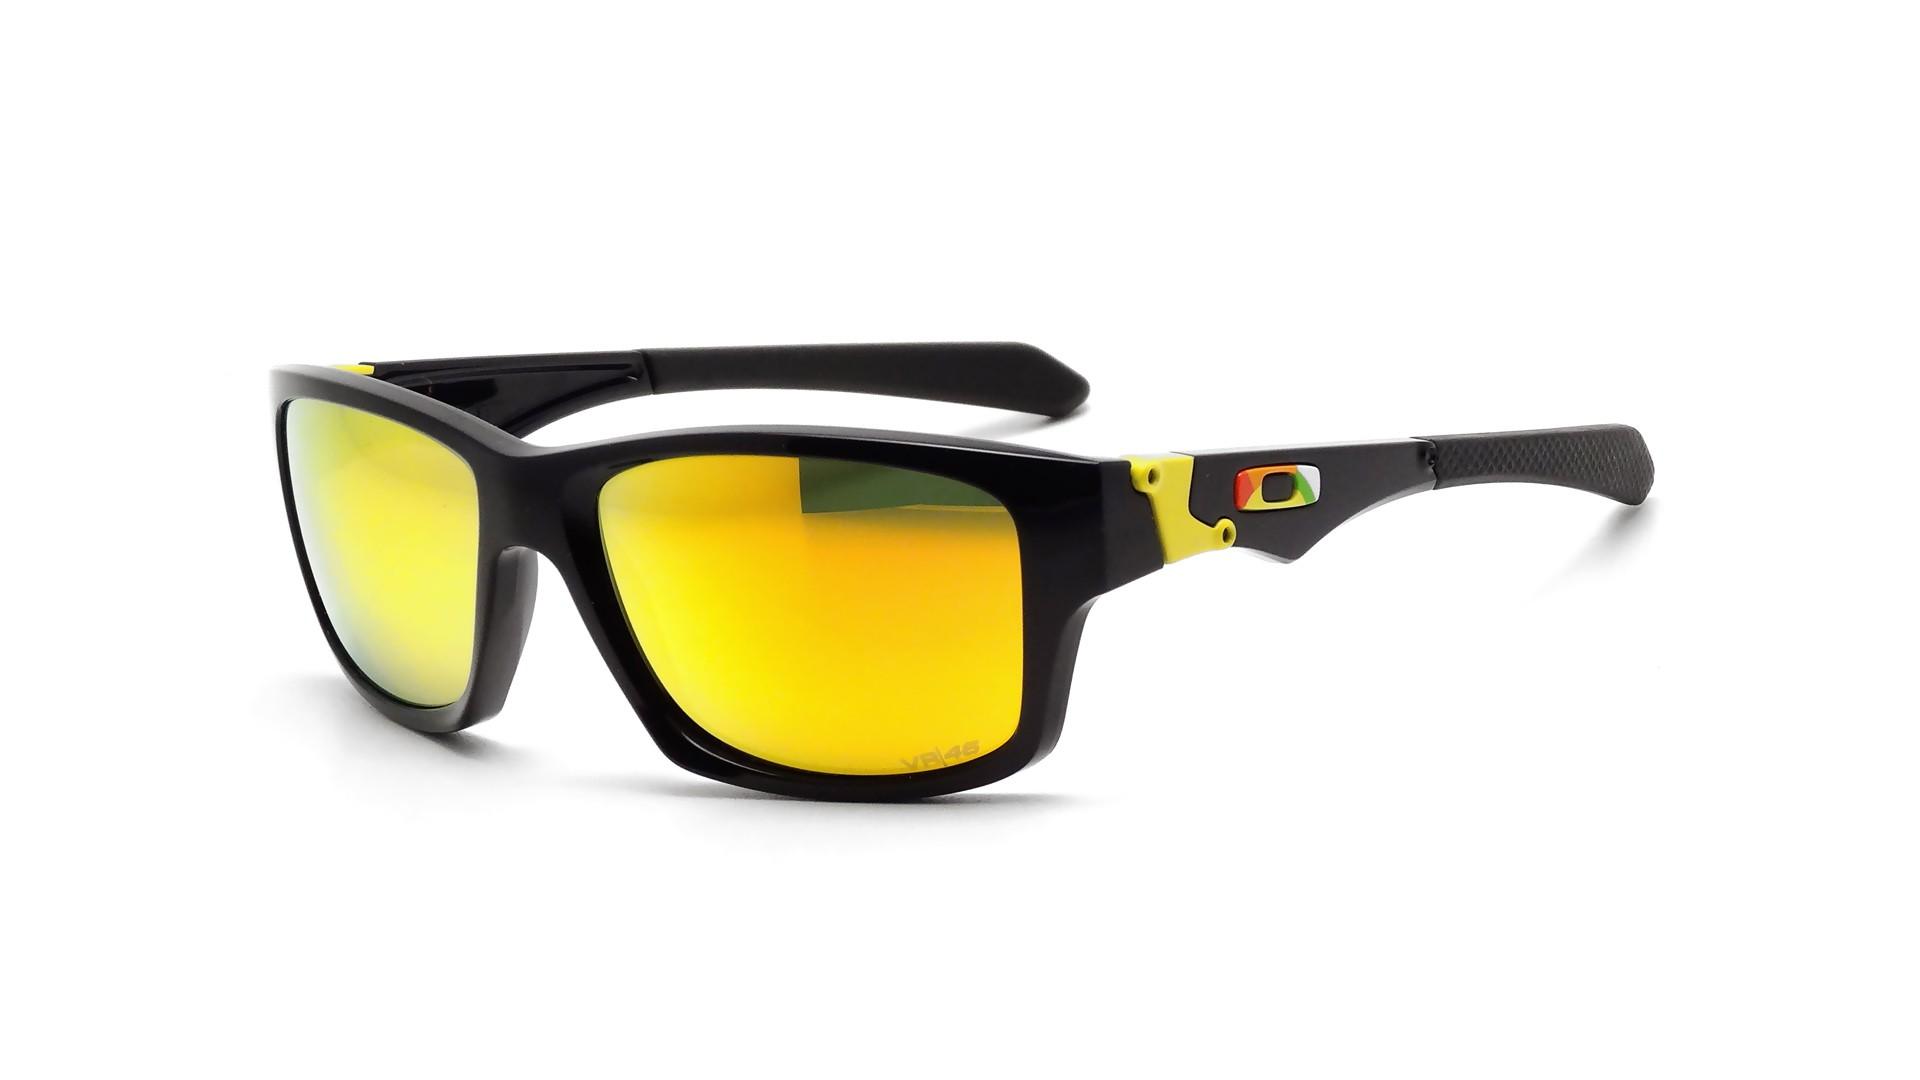 Oakley Jupiter Glasses